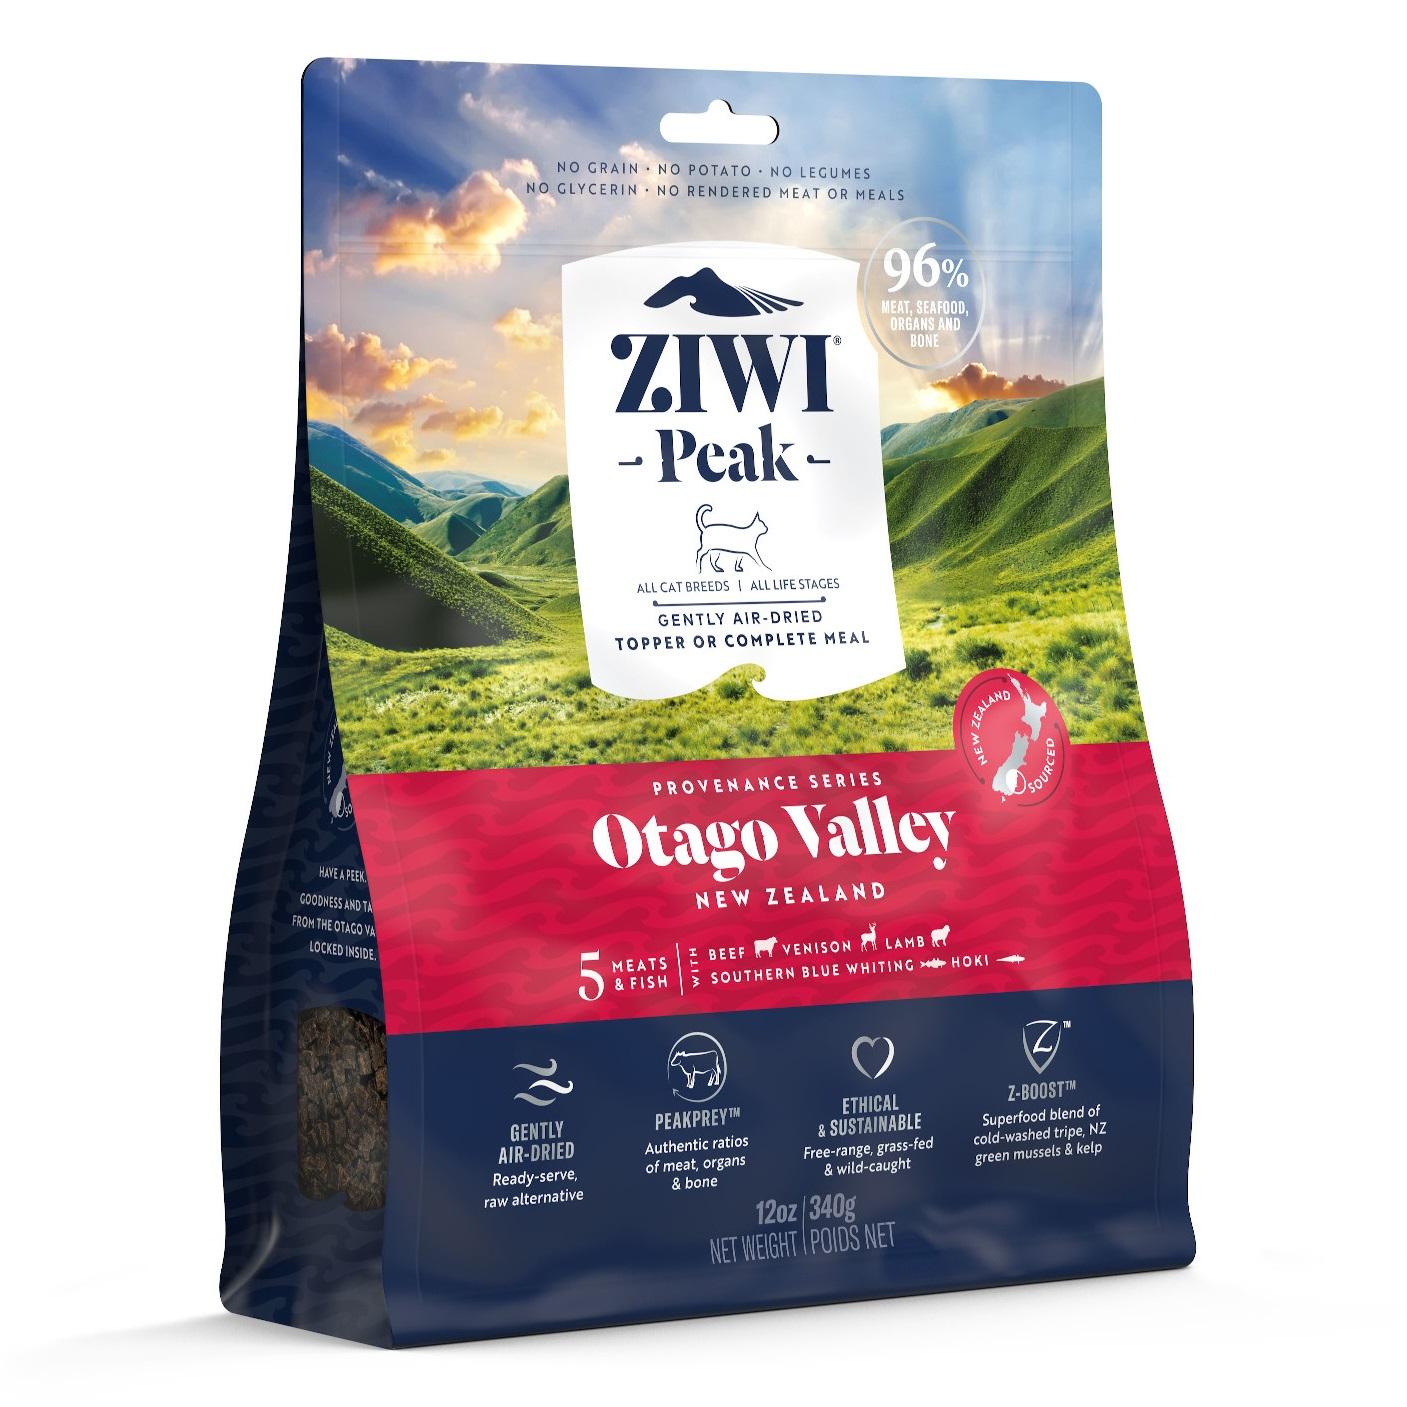 ZIWI Peak Provenance Air-Dried Cat Food Otago Valley Recipe, 12-oz